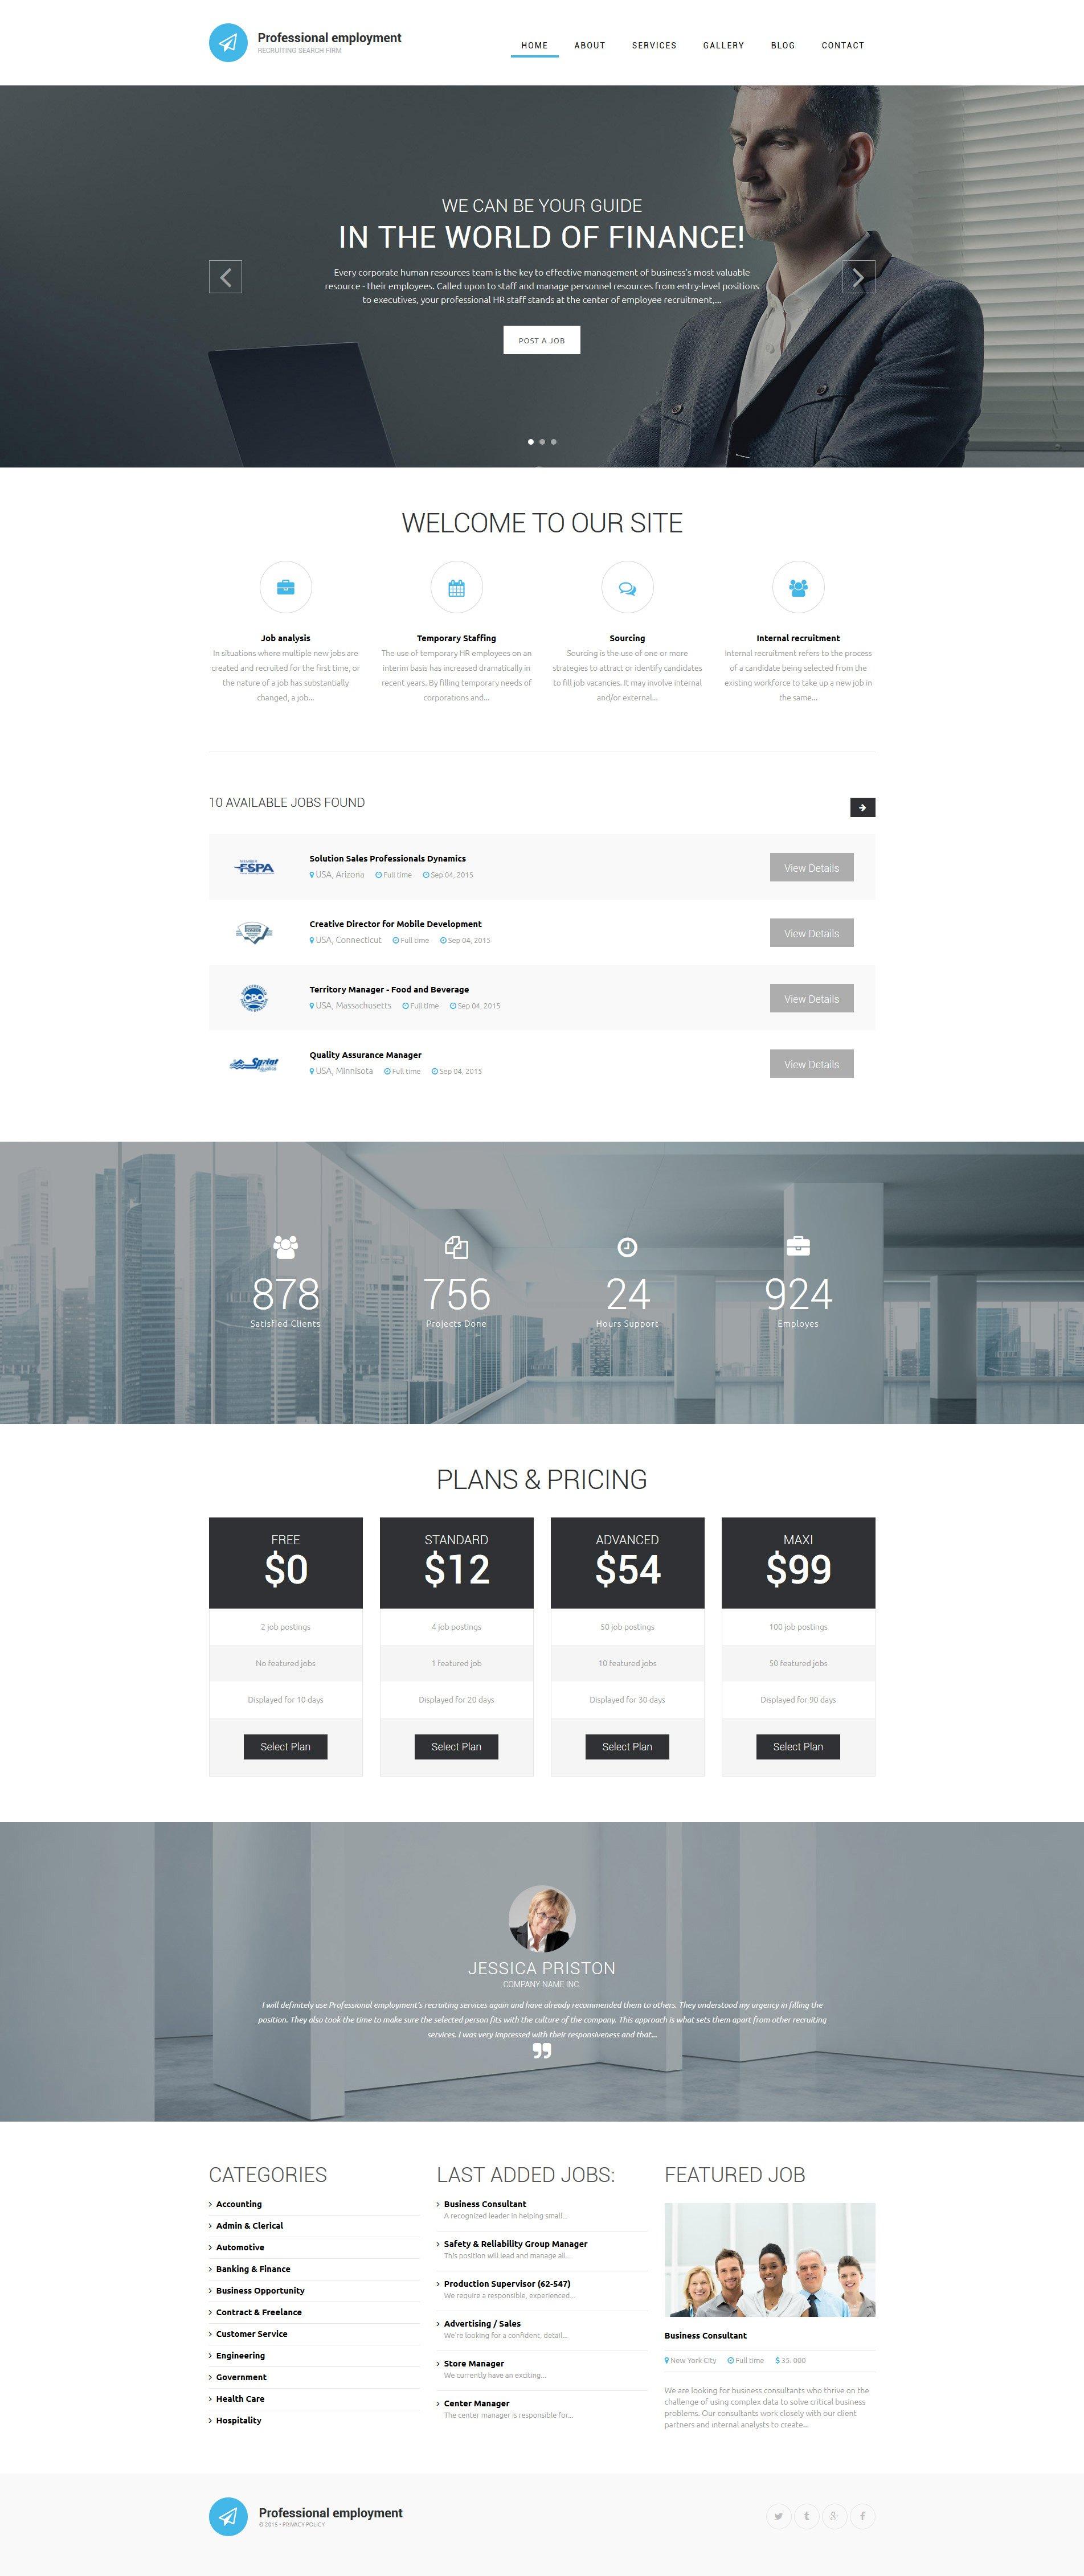 Szablon Drupal Professional Employment #55959 - zrzut ekranu